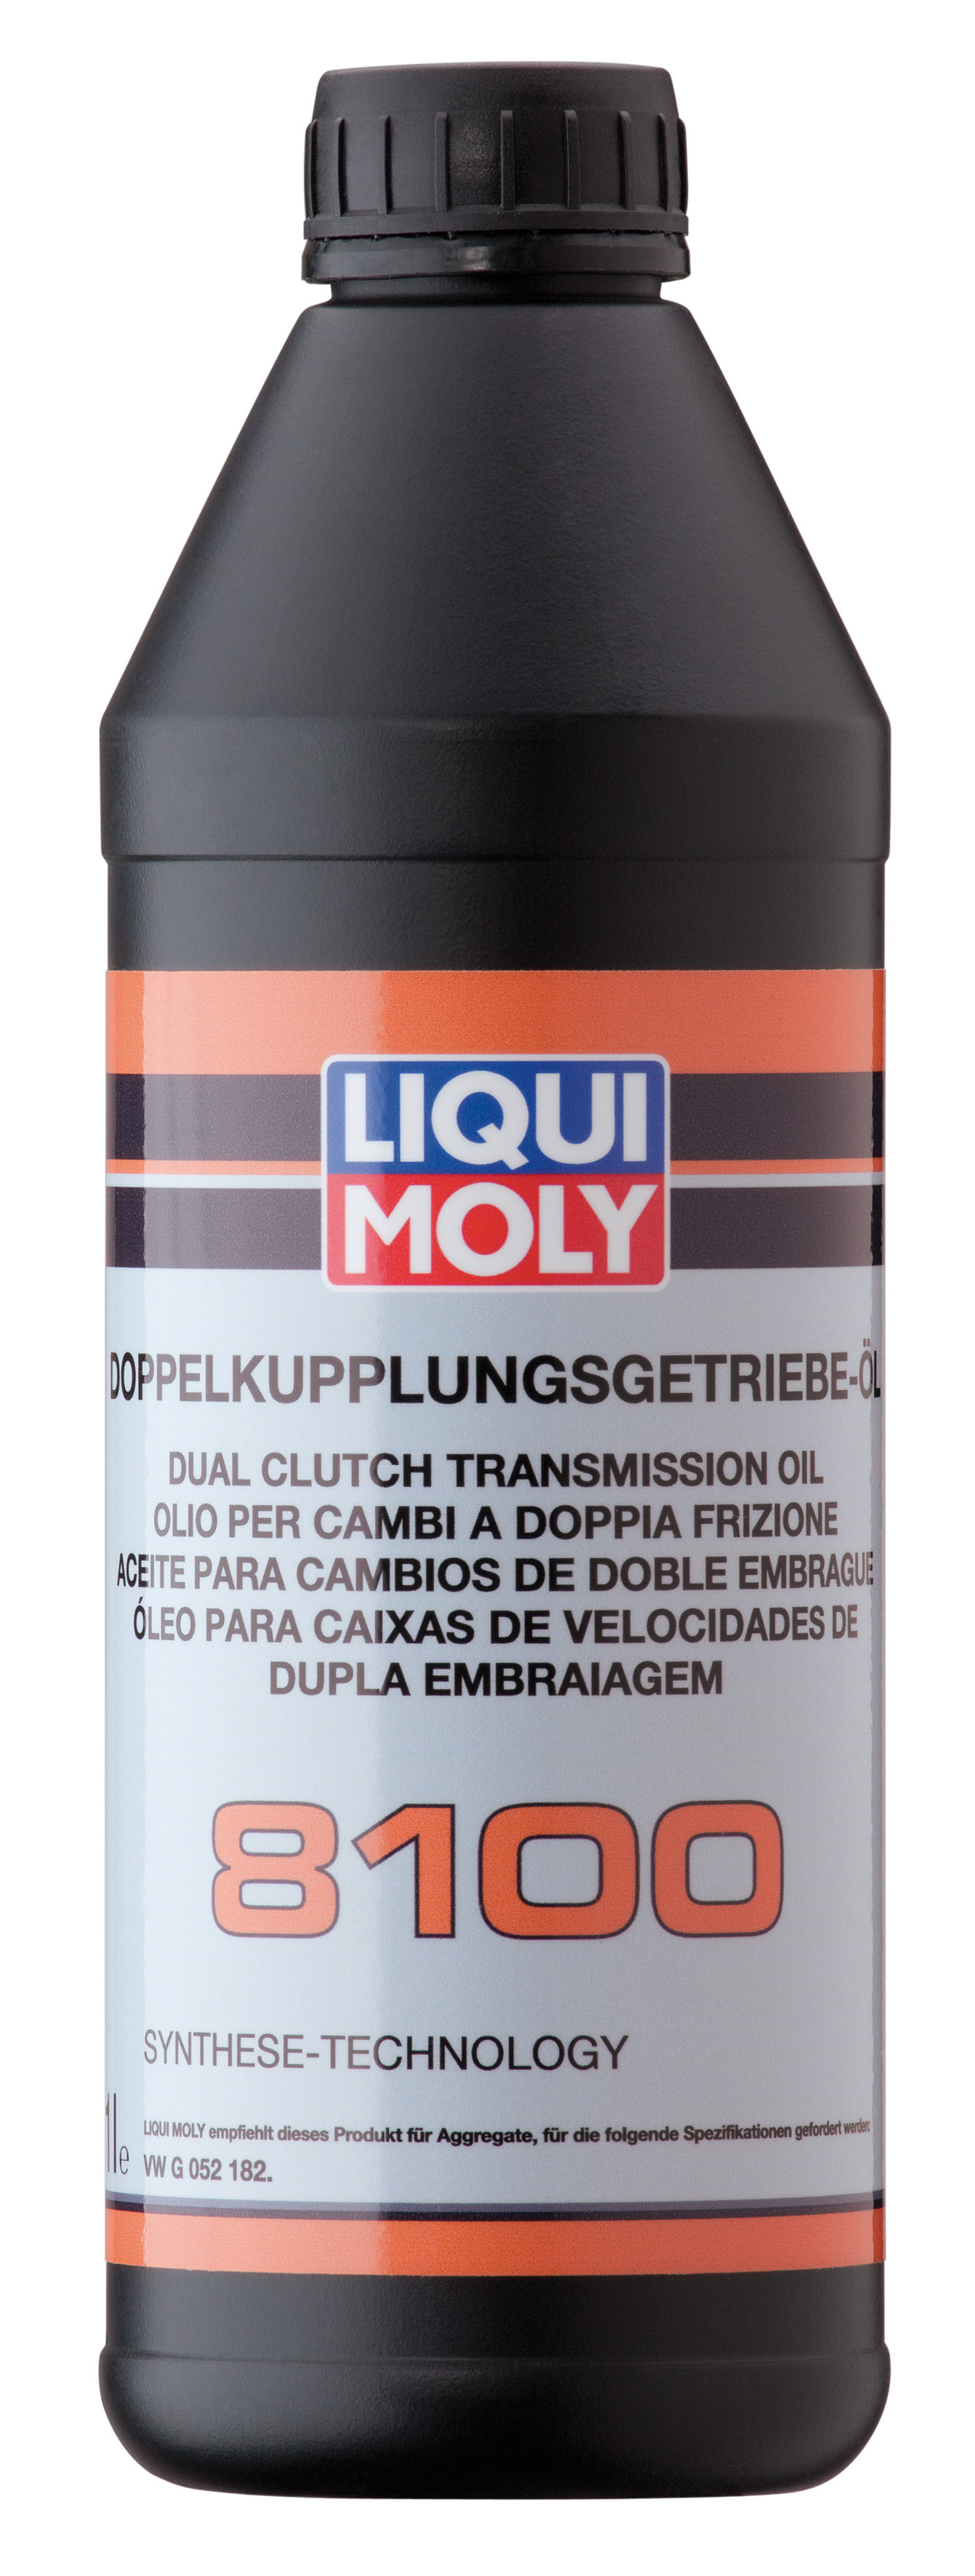 Liqui Moly 8100 DSG 1 liter